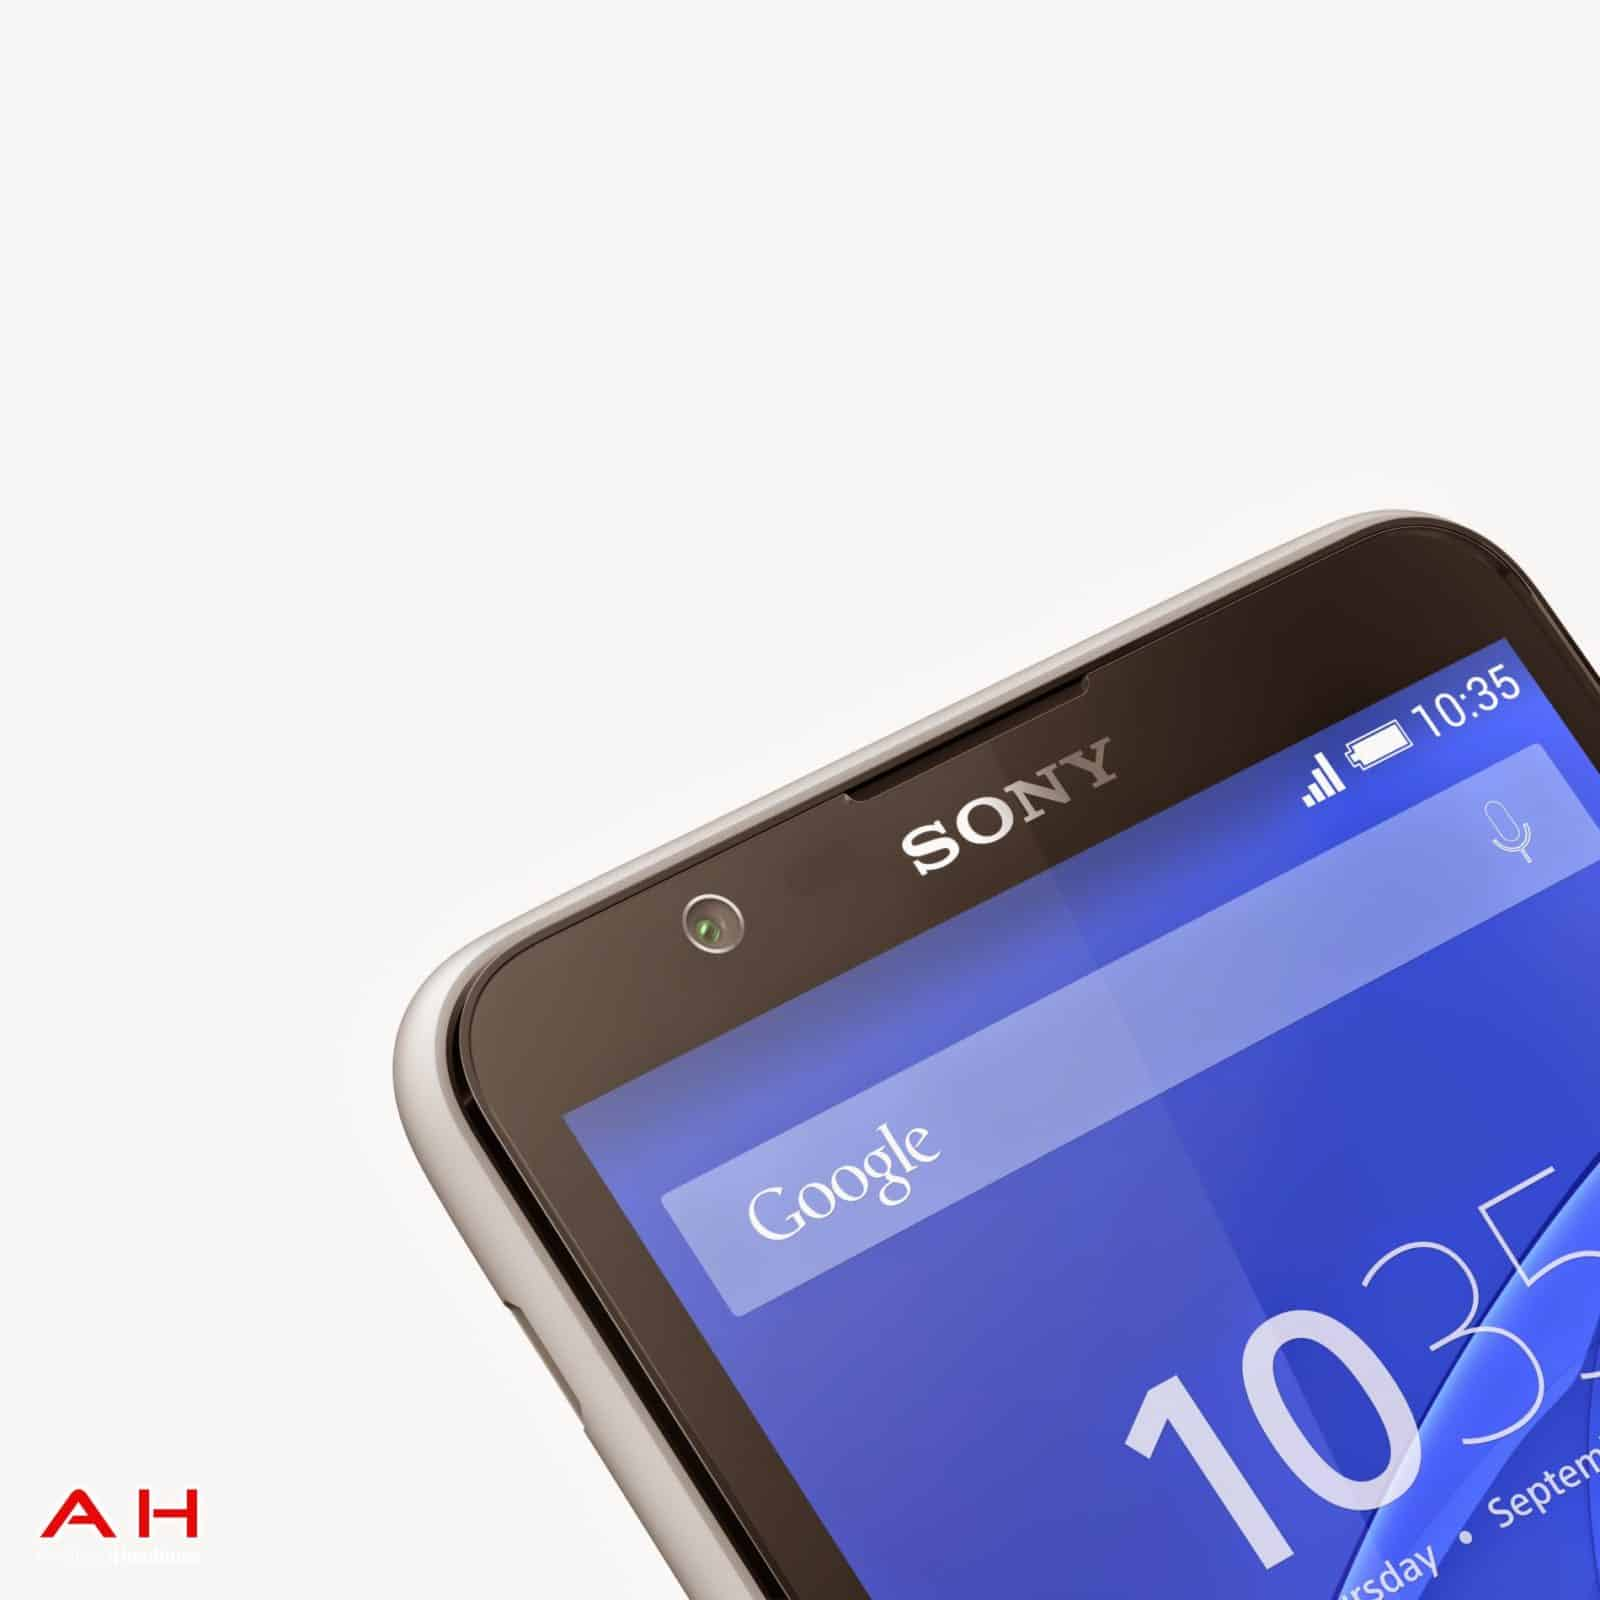 Sony Xperia E4 AH 09